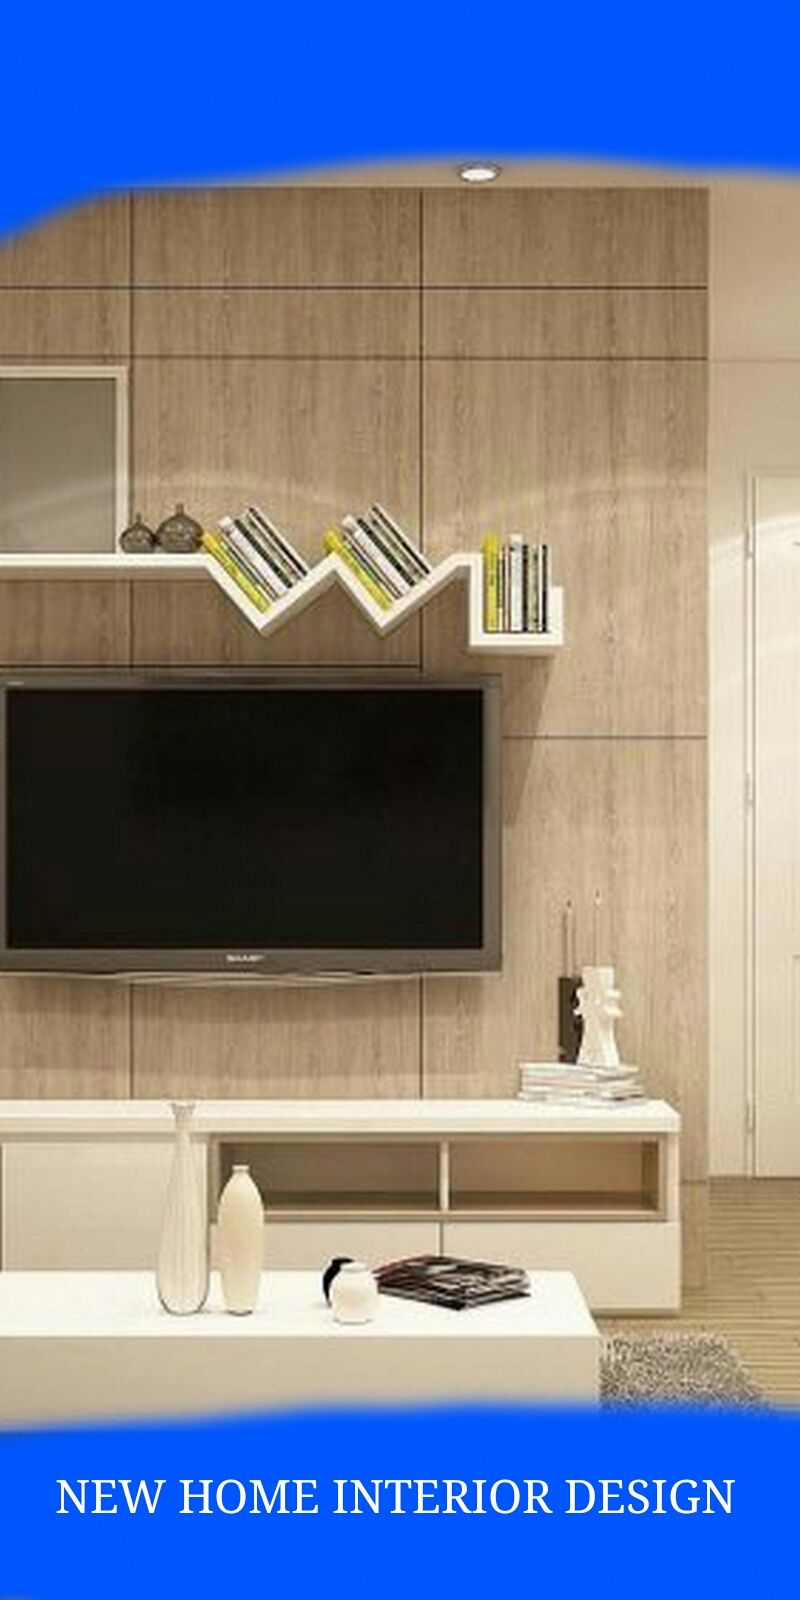 Home interior design india also inspiring decorating ideas rh pinterest